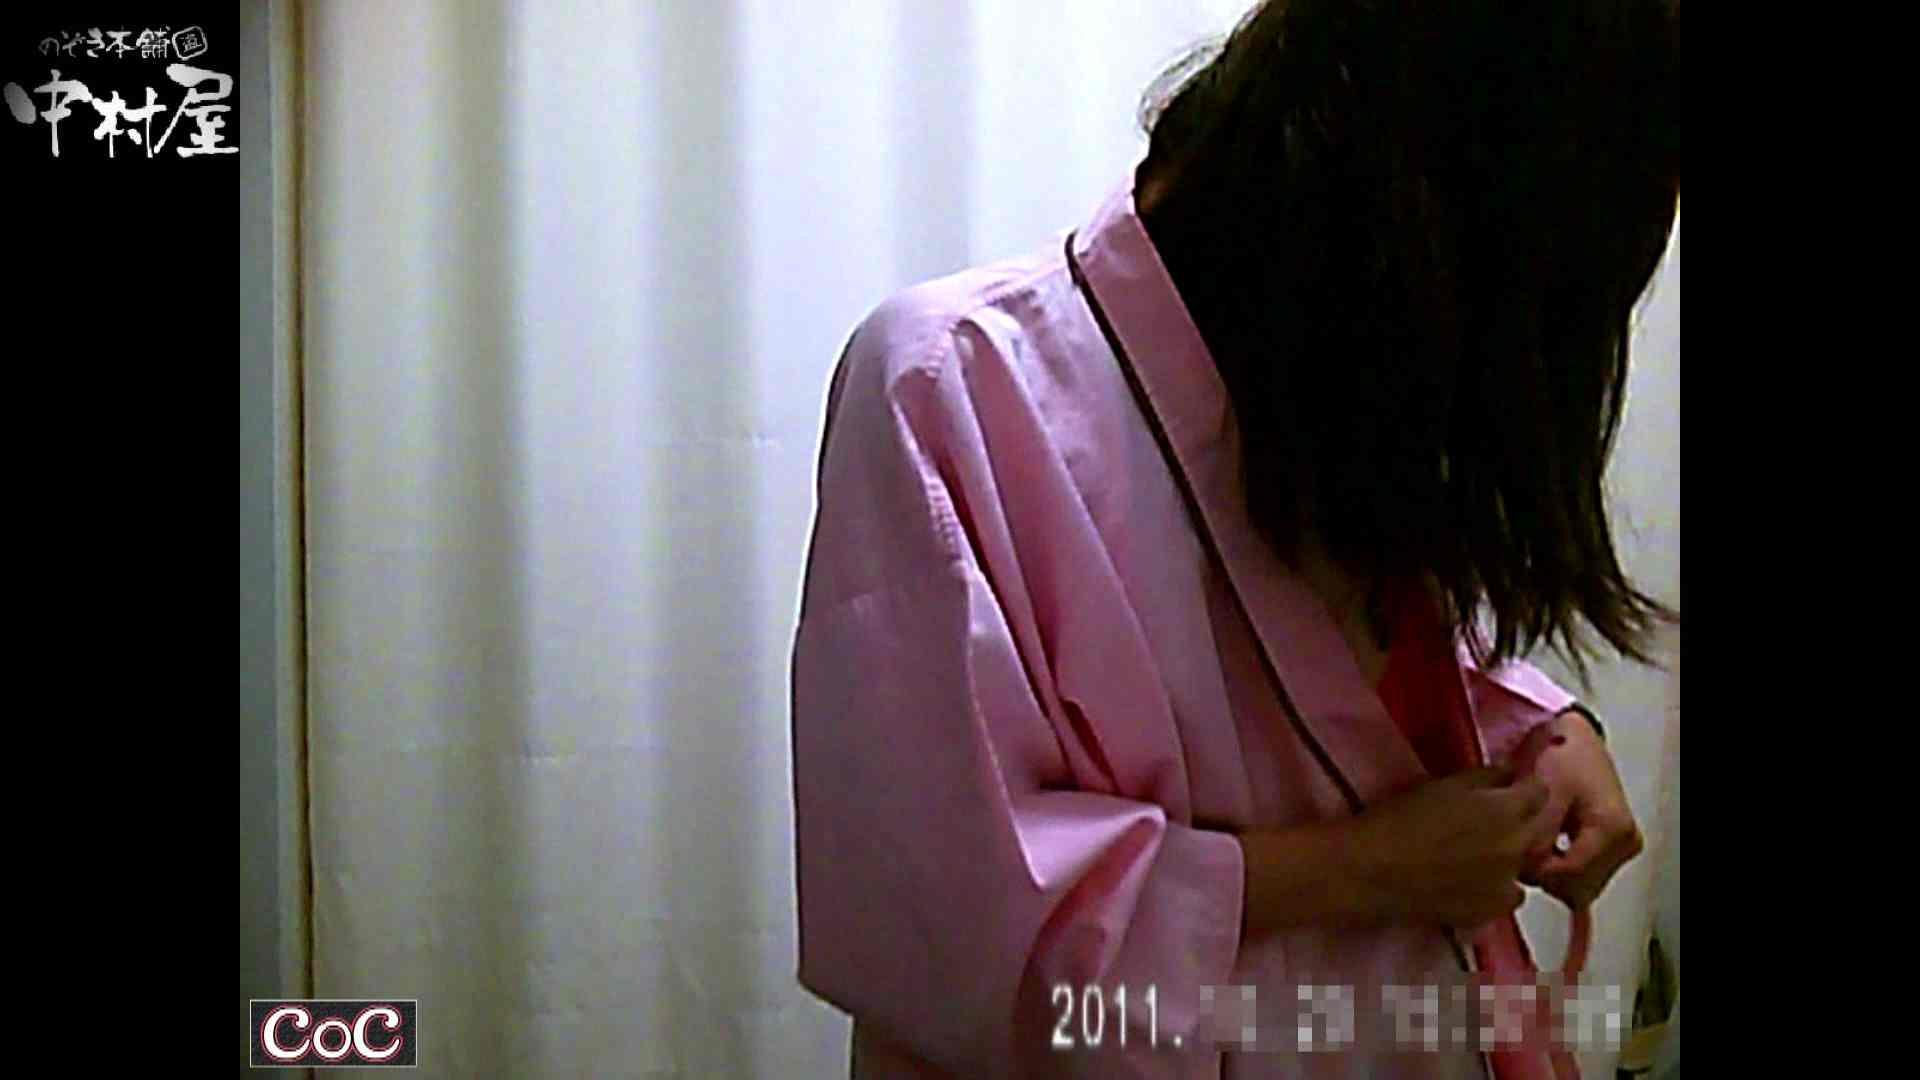 Doctor-X元医者による反抗vol.64後編 おまんこ見放題 | 盗撮シリーズ  104PIX 83